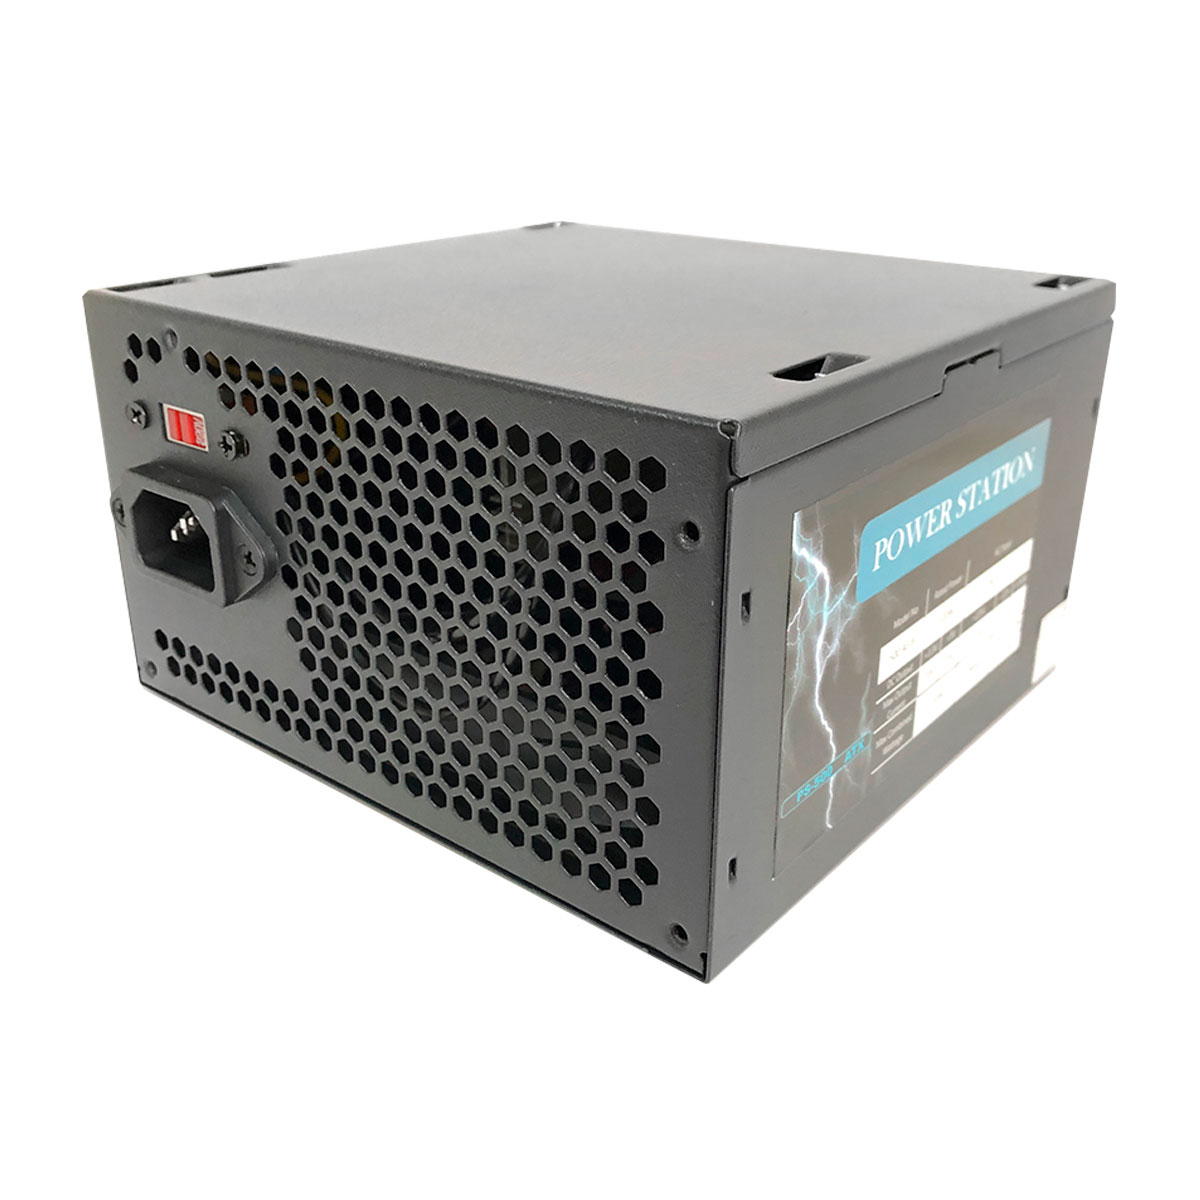 Fonte ATX Power Station PS-500 500W, Bivolt, Preto